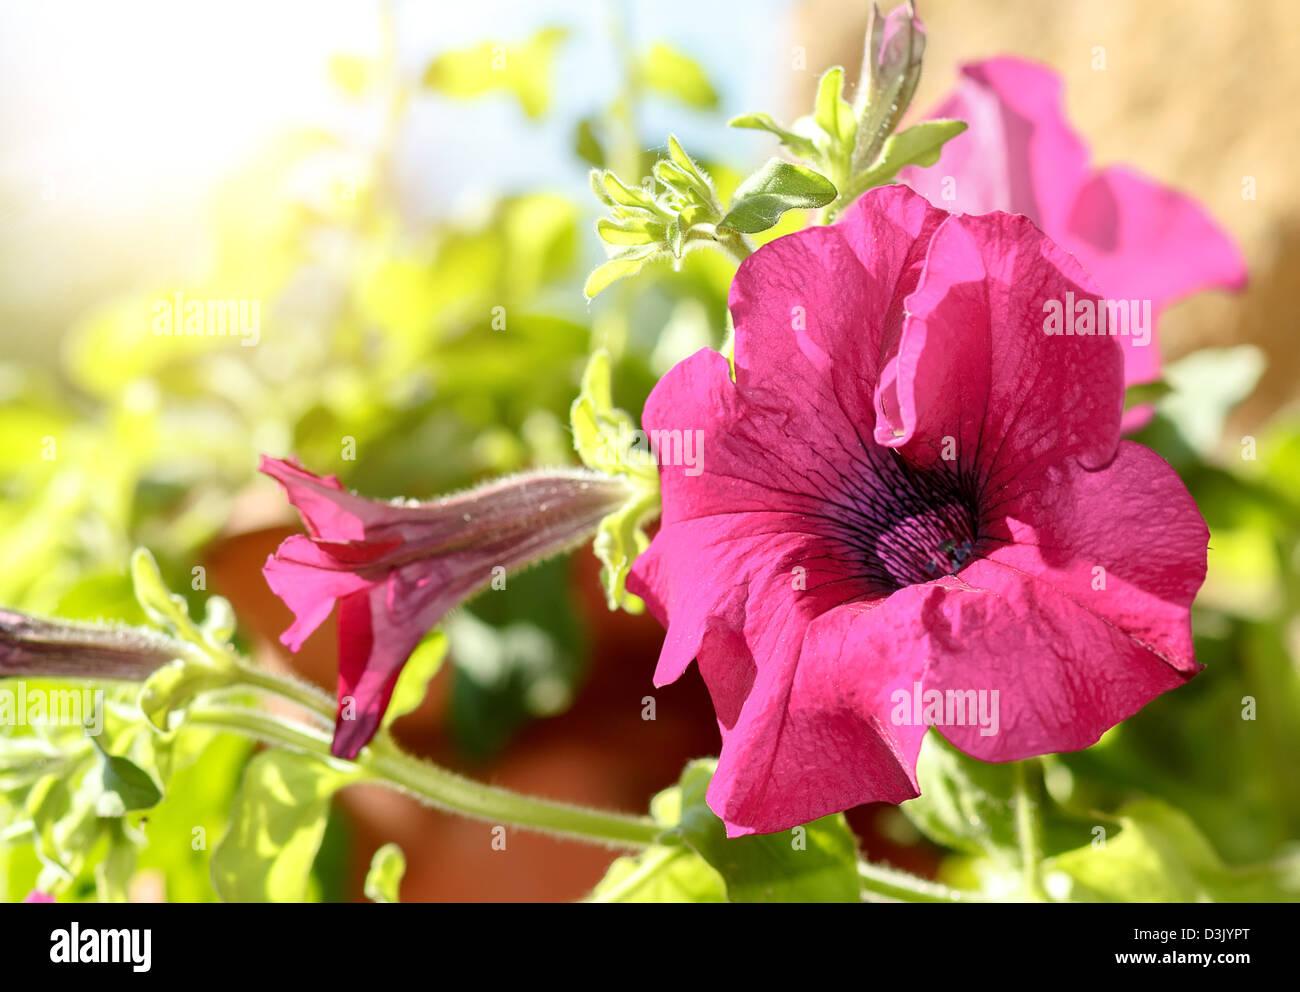 Pink flower Petunia Surfinia Vein in garden - Stock Image